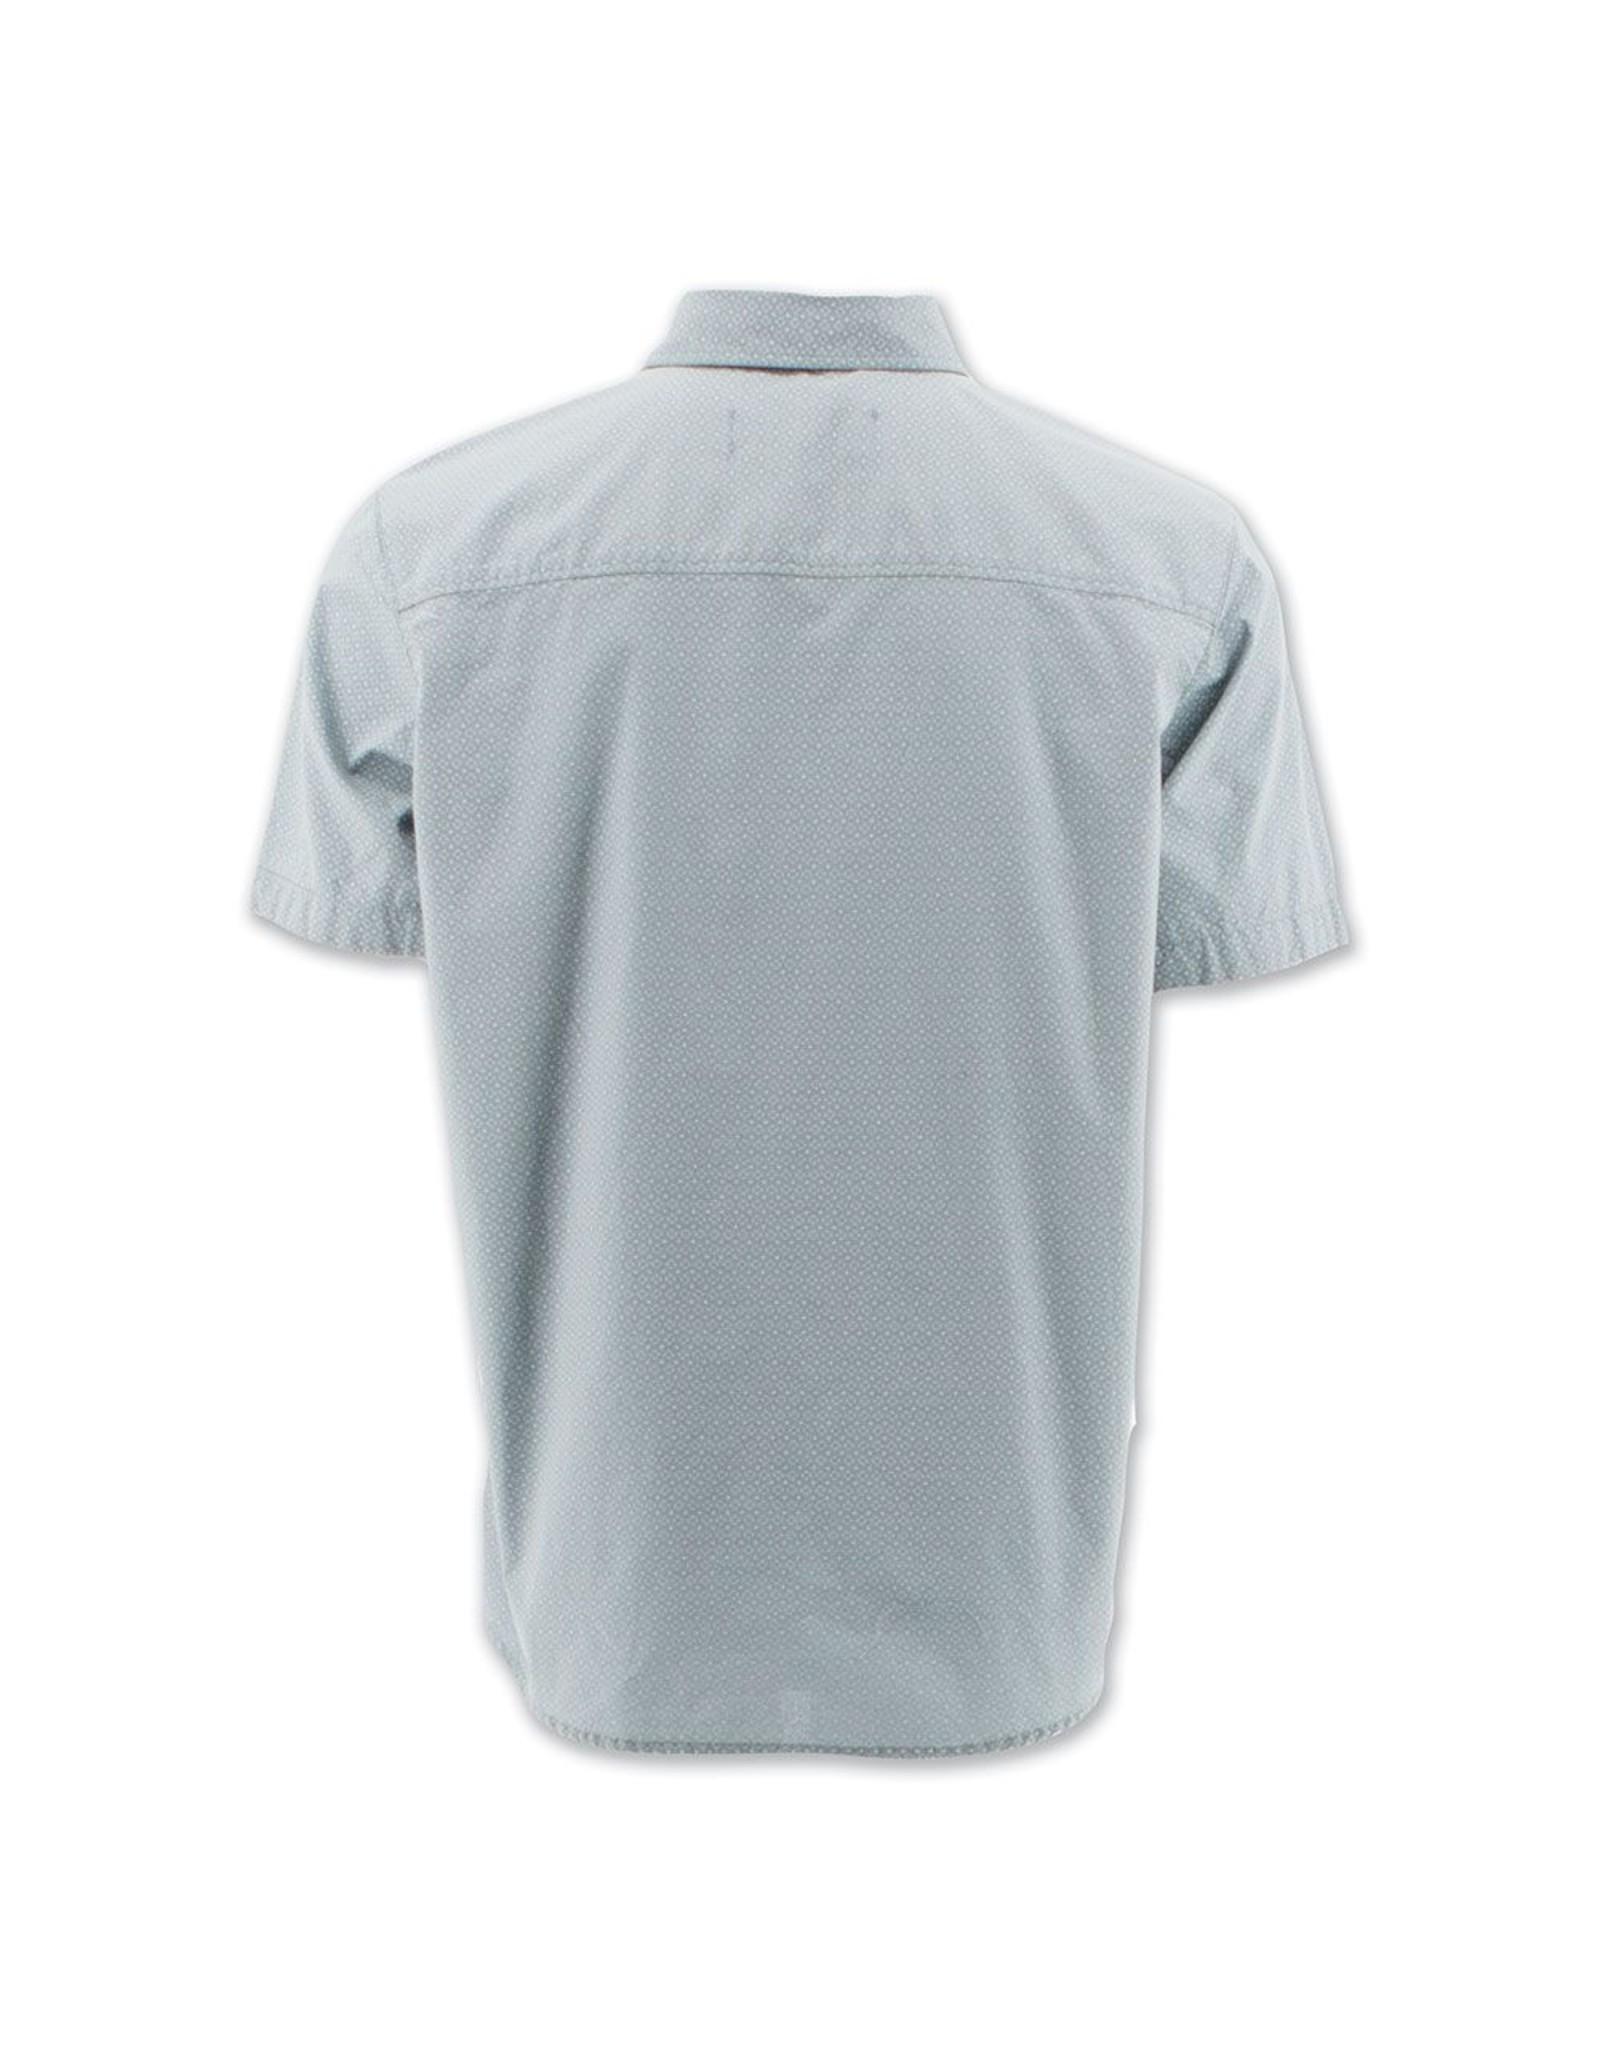 Ecoths Vogel short sleeve